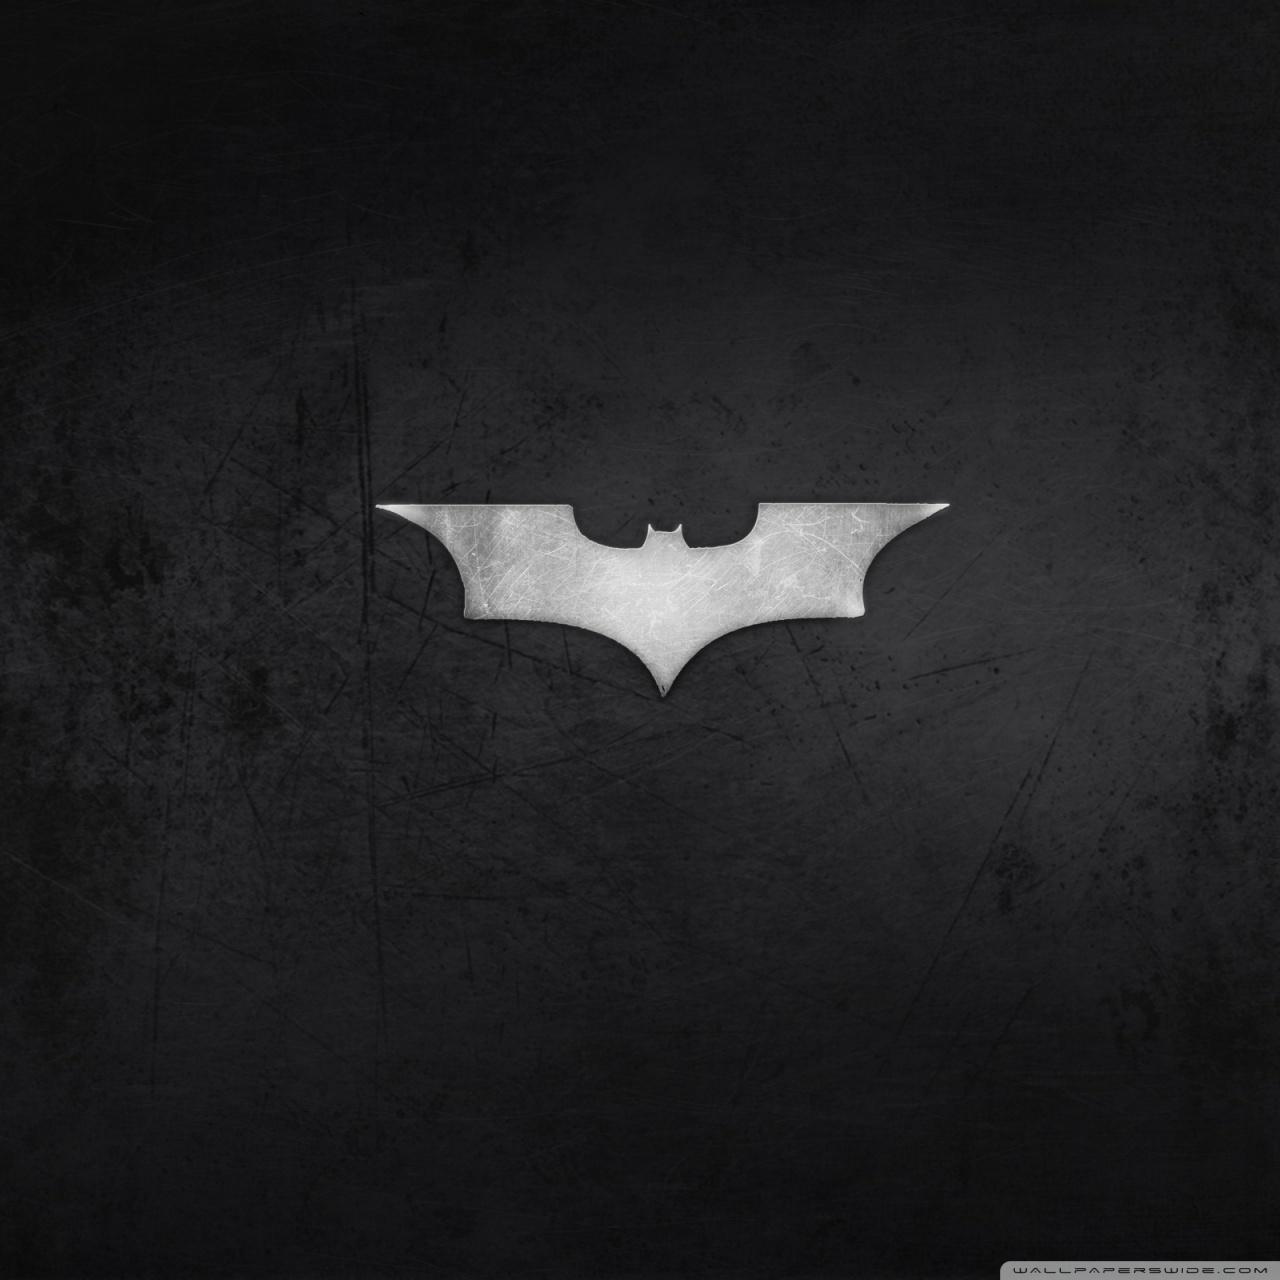 batman logo ❤ uhd desktop wallpaper for ultra hd 4k 8k • mobile